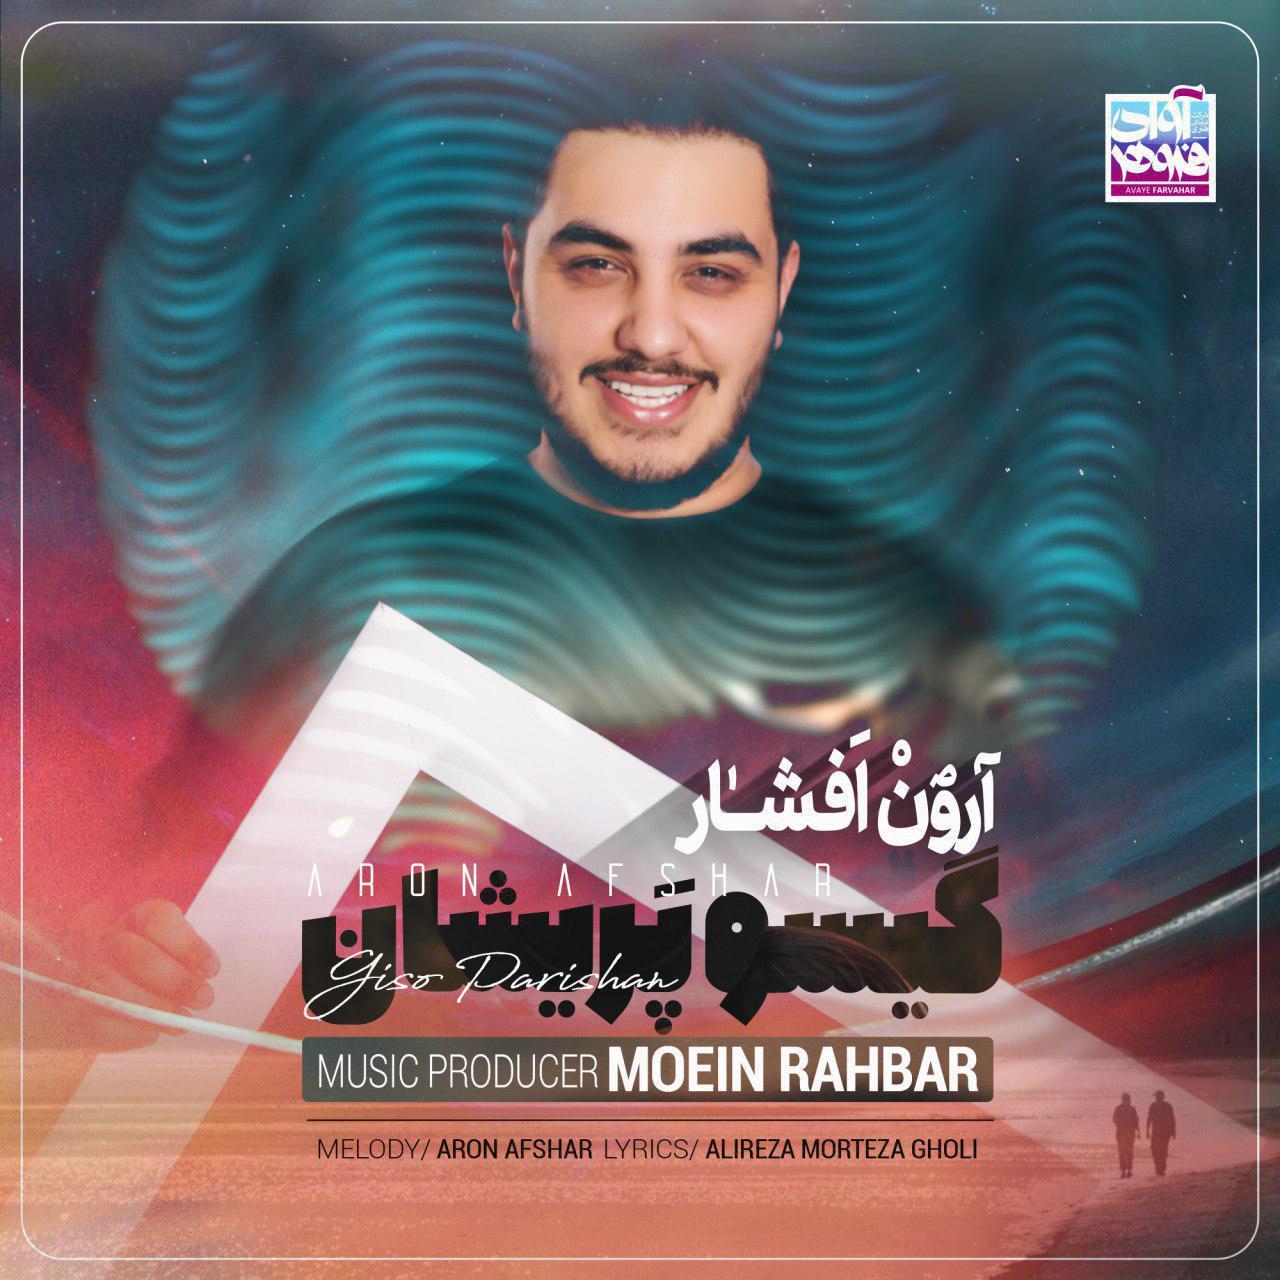 Aron Afshar - Gisoo Parishan Music | آهنگ آرون افشار - گیسو پریشان